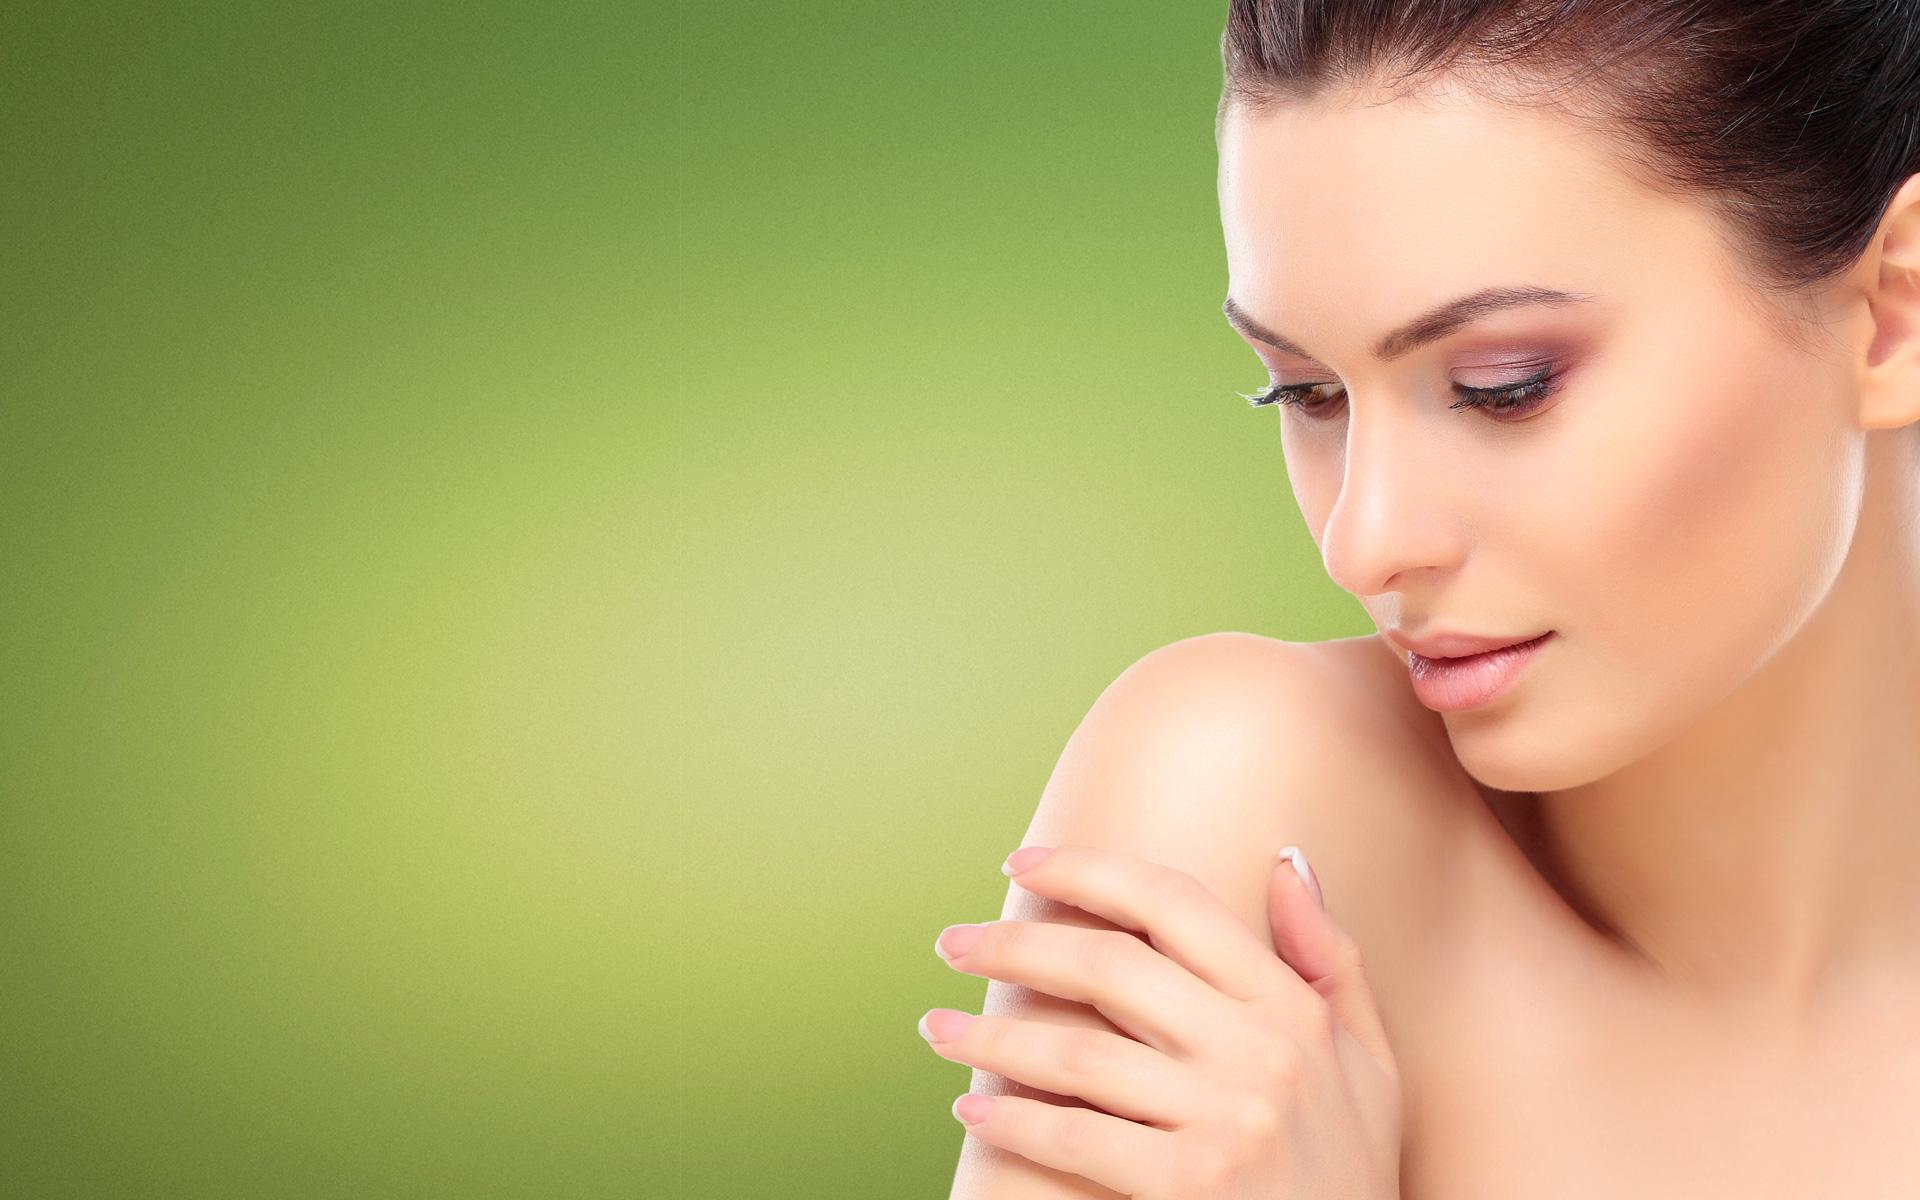 skin care clinics penticton